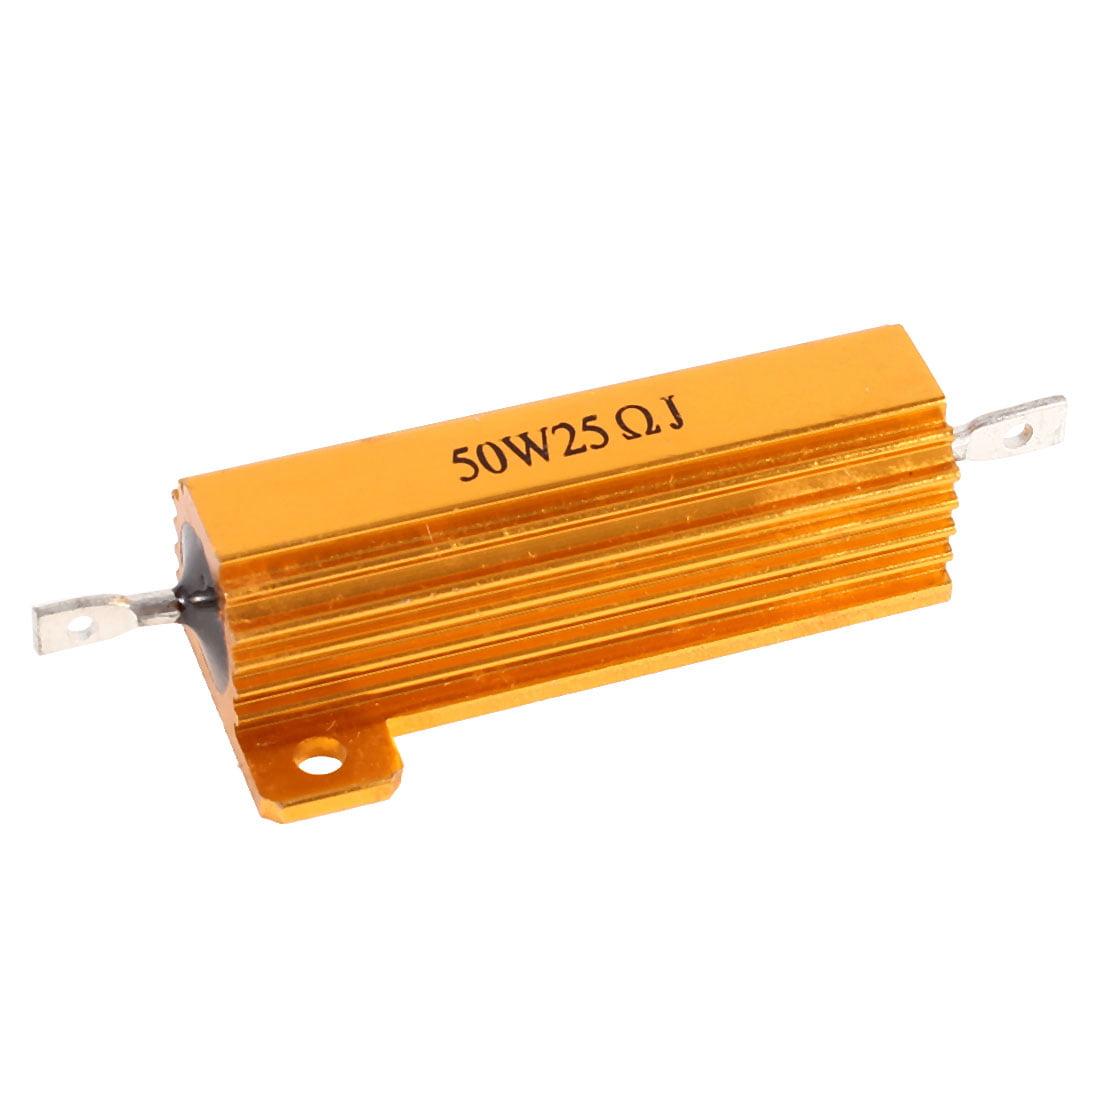 Unique Bargains 25 Ohm Screw Tap Mounted Audio Aluminum Wirewound Resistors 50W Gold Tone